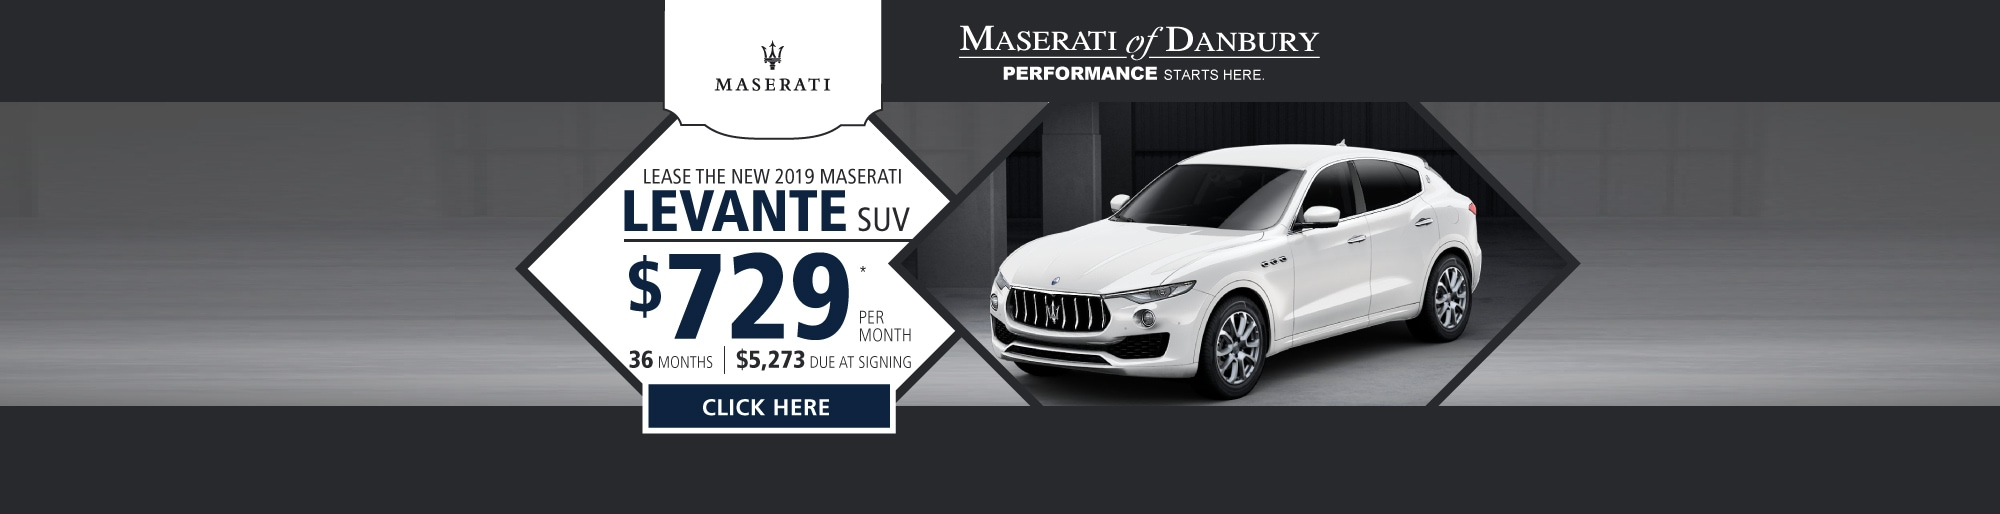 Suv Lease Specials >> Lease Specials Maserati Of Danbury